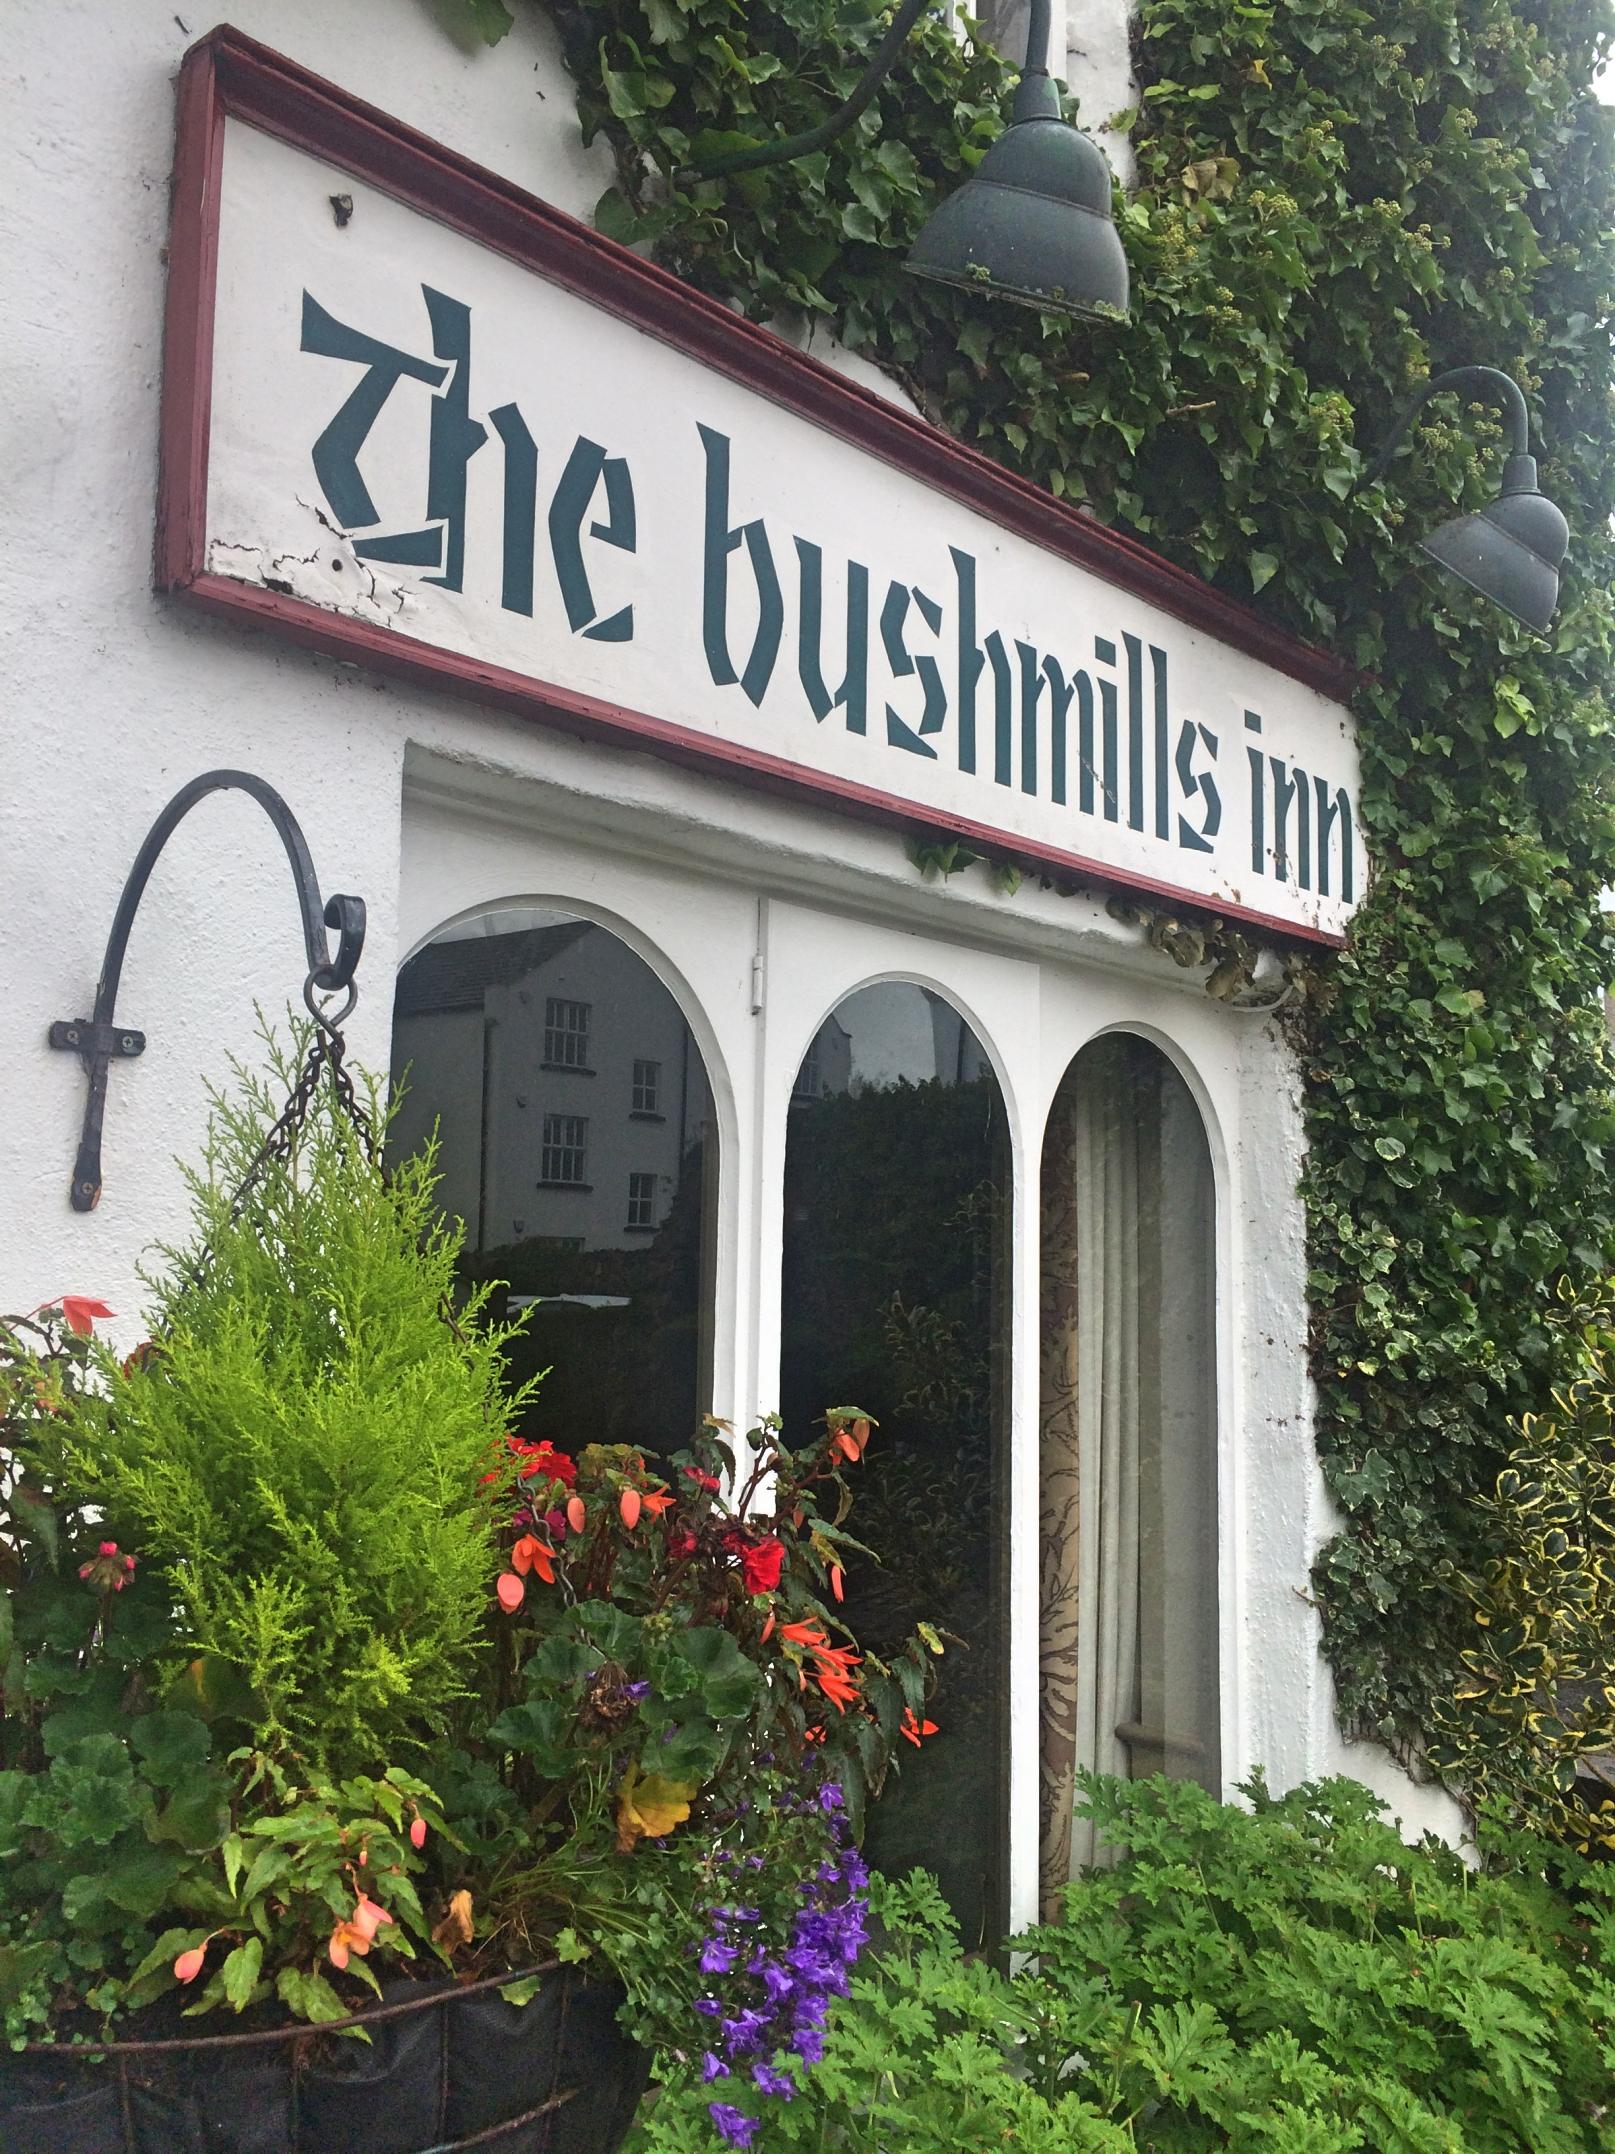 bushmills_inn_whiskey_northern_ireland_niexplorer_ni_explorer (1).jpg